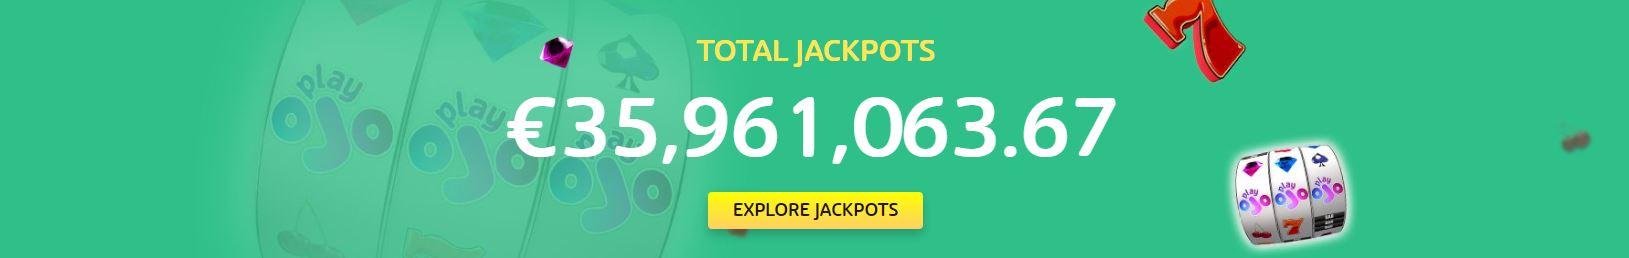 Total Jackpots